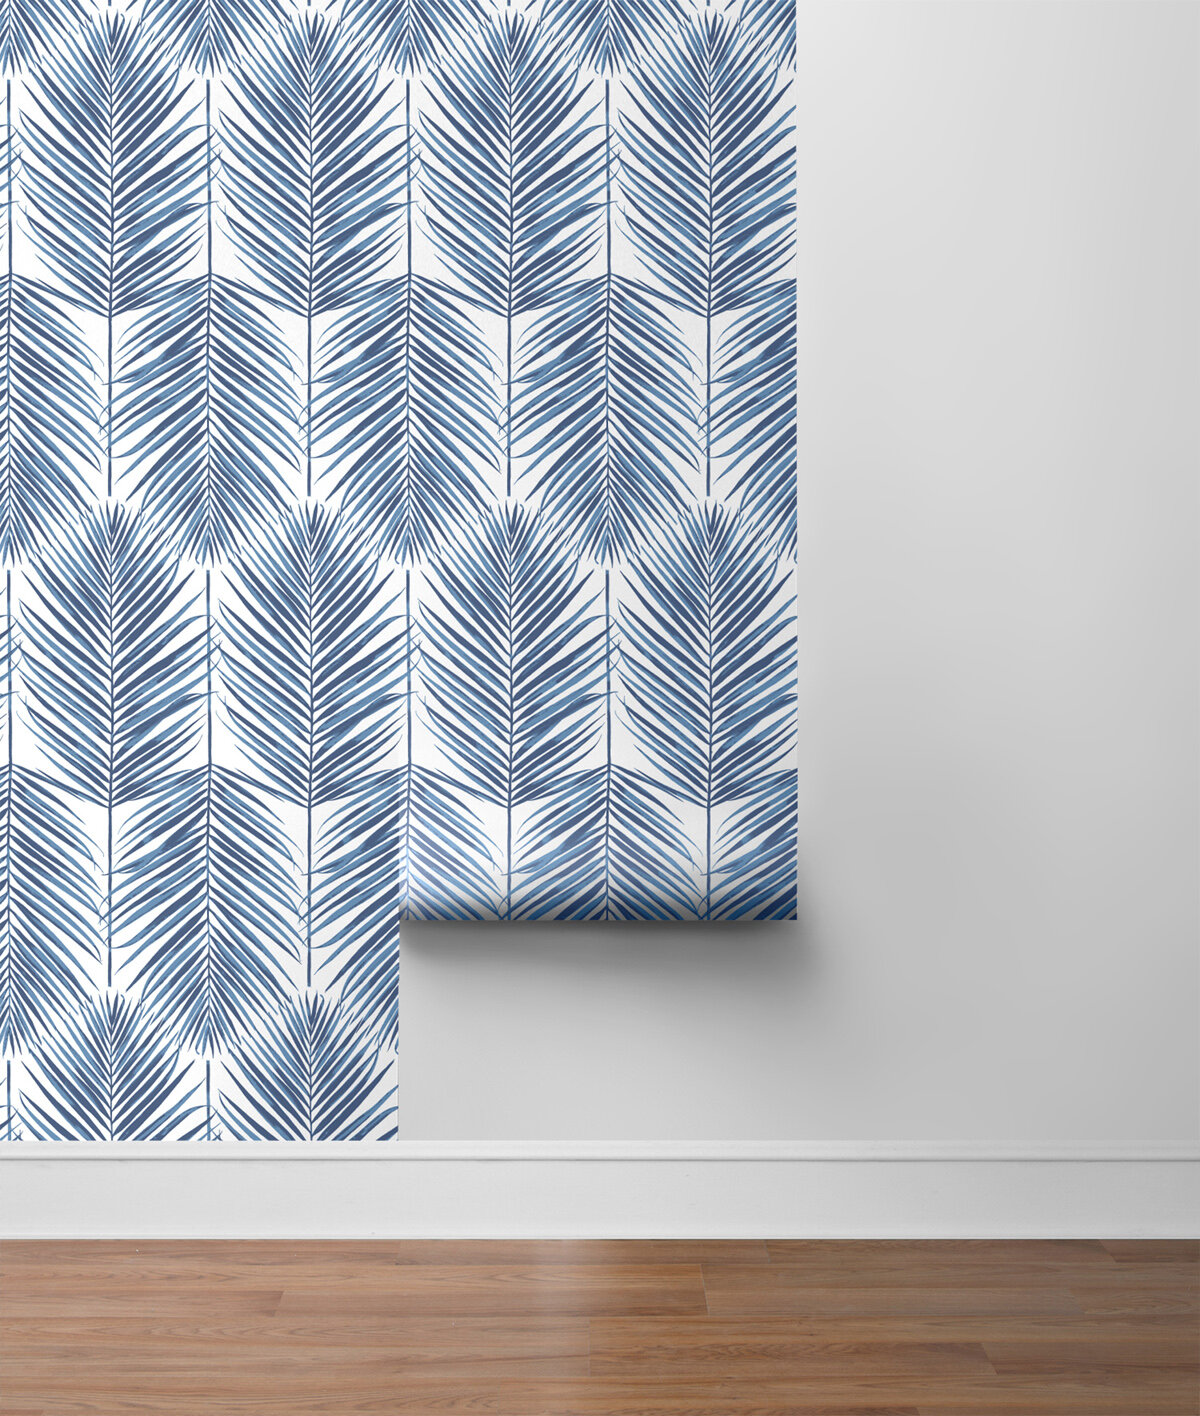 Bayou Breeze Lipman Paradise Palm 18 L X 20 5 W Peel And Stick Wallpaper Roll Reviews Wayfair